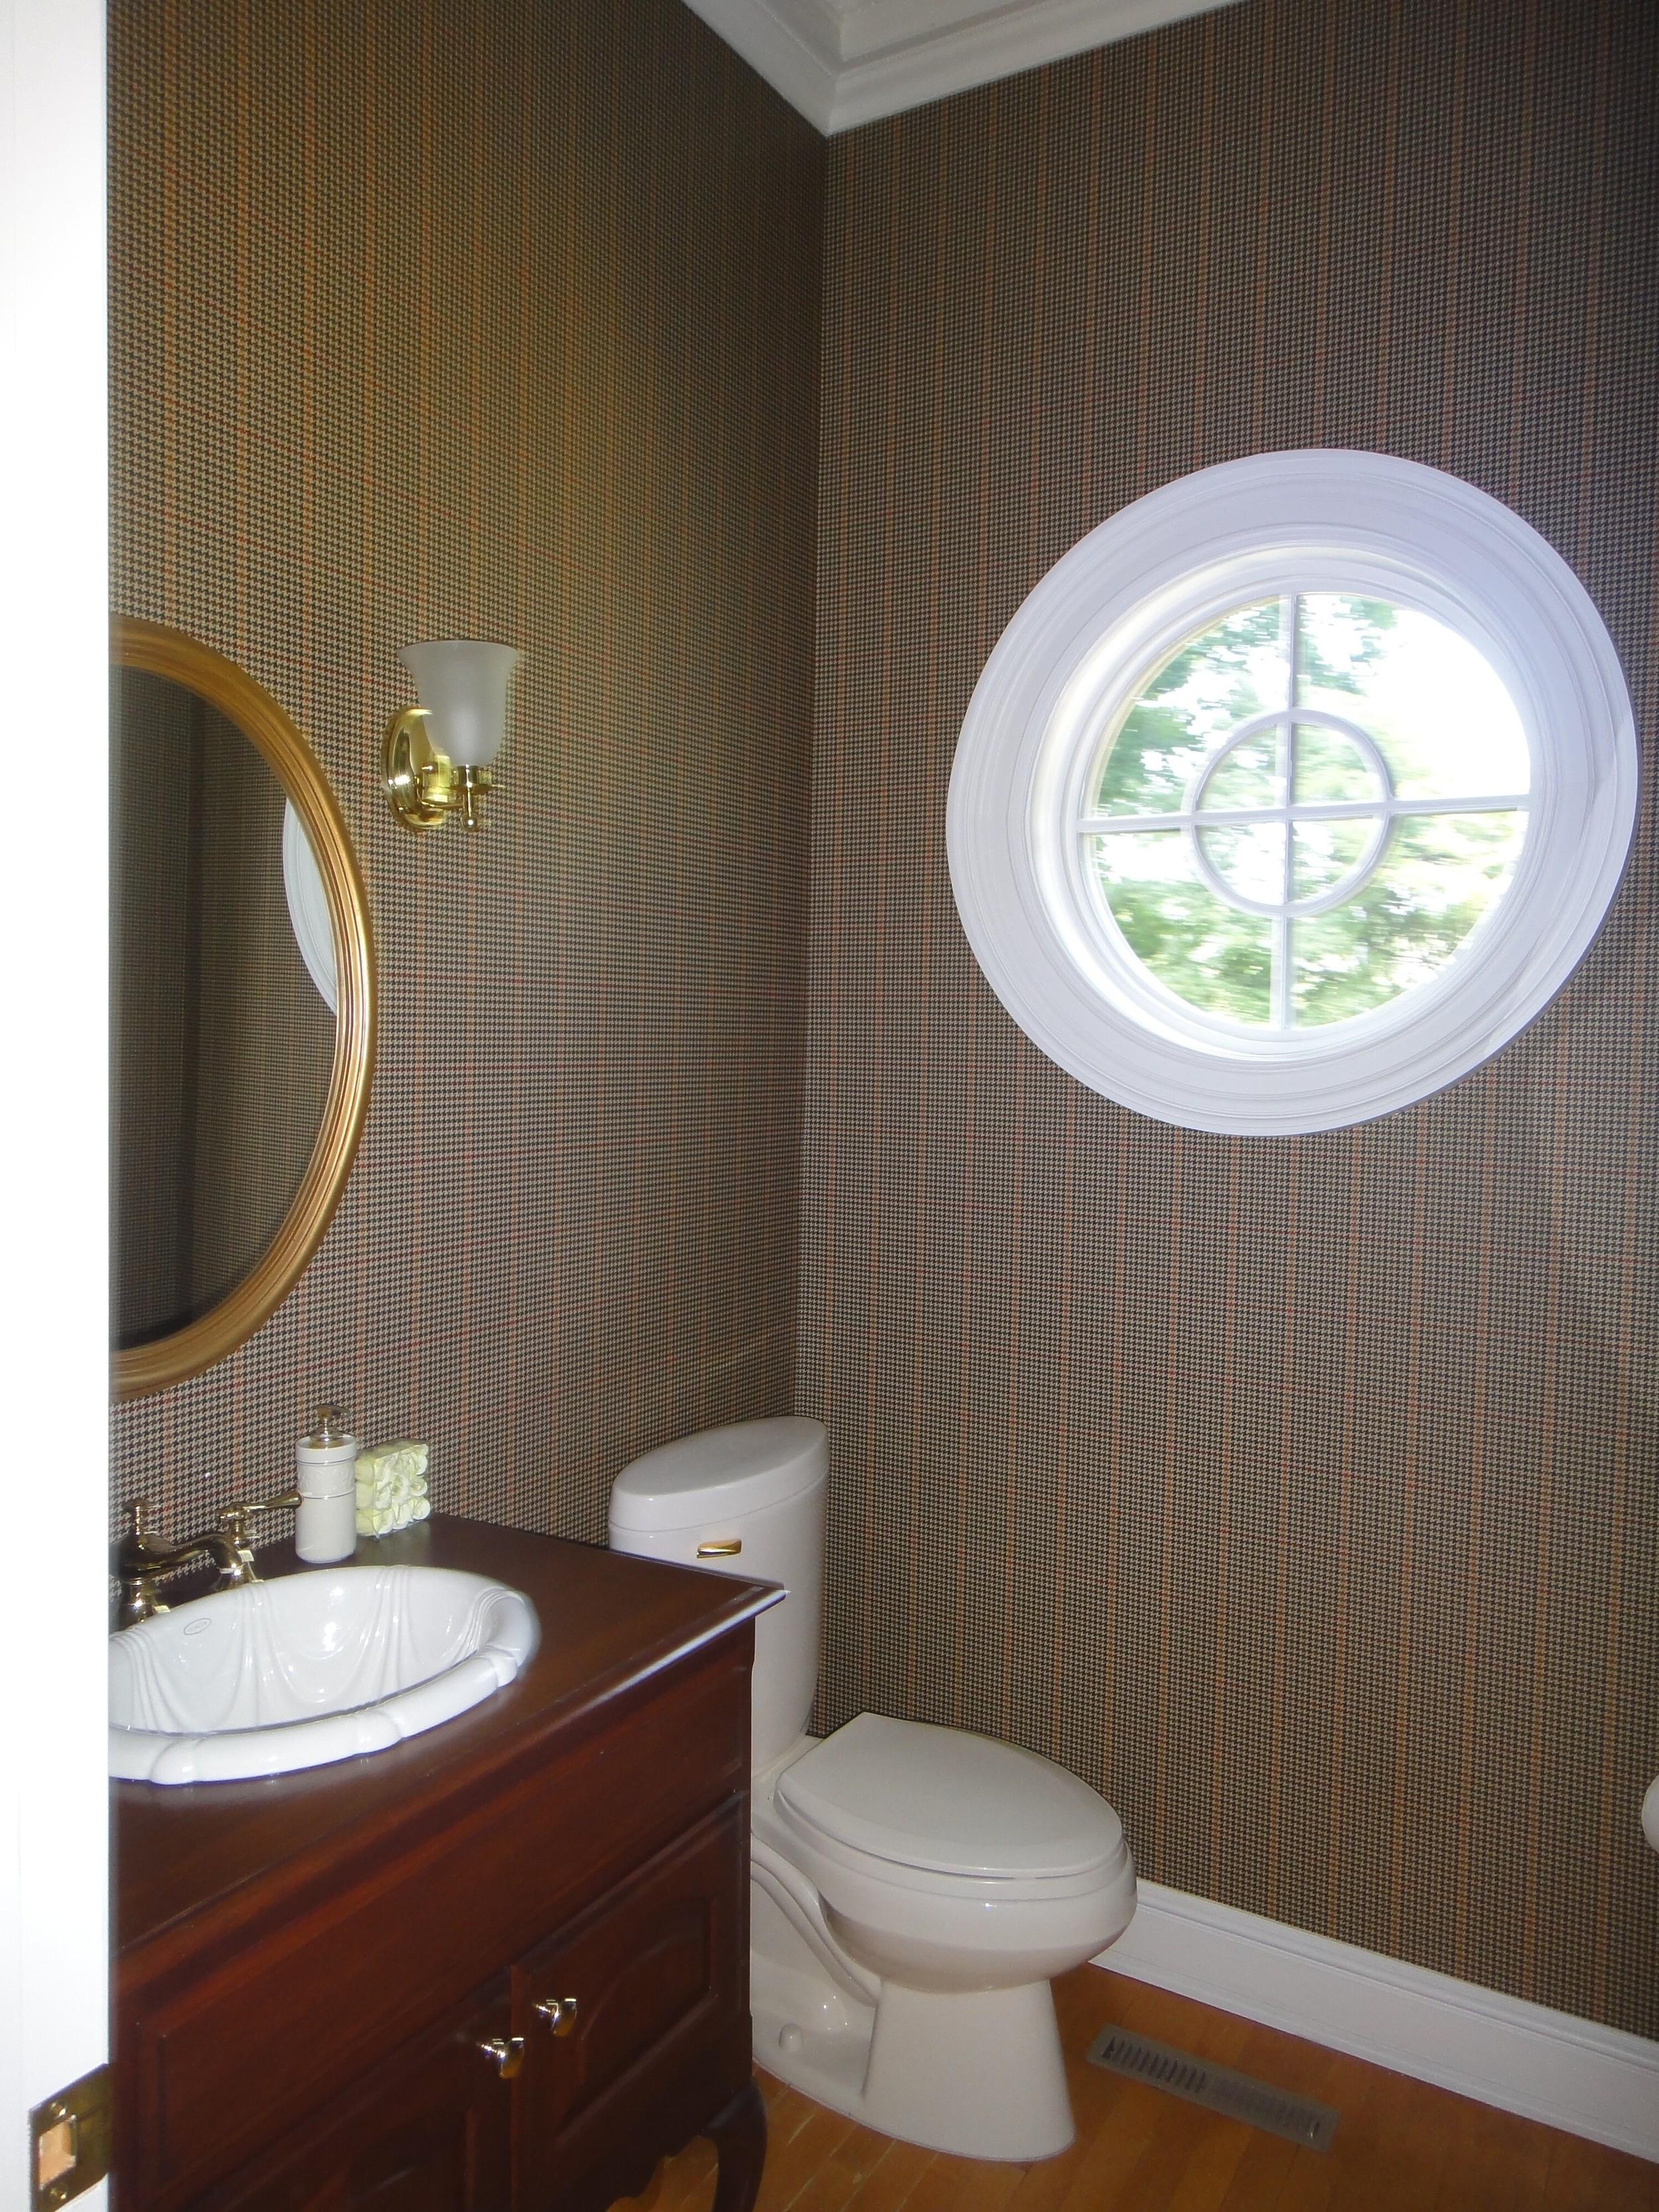 Plaid wallpaper, 'fauxhogany' sink vanityw/Roman swag fantasy sink...